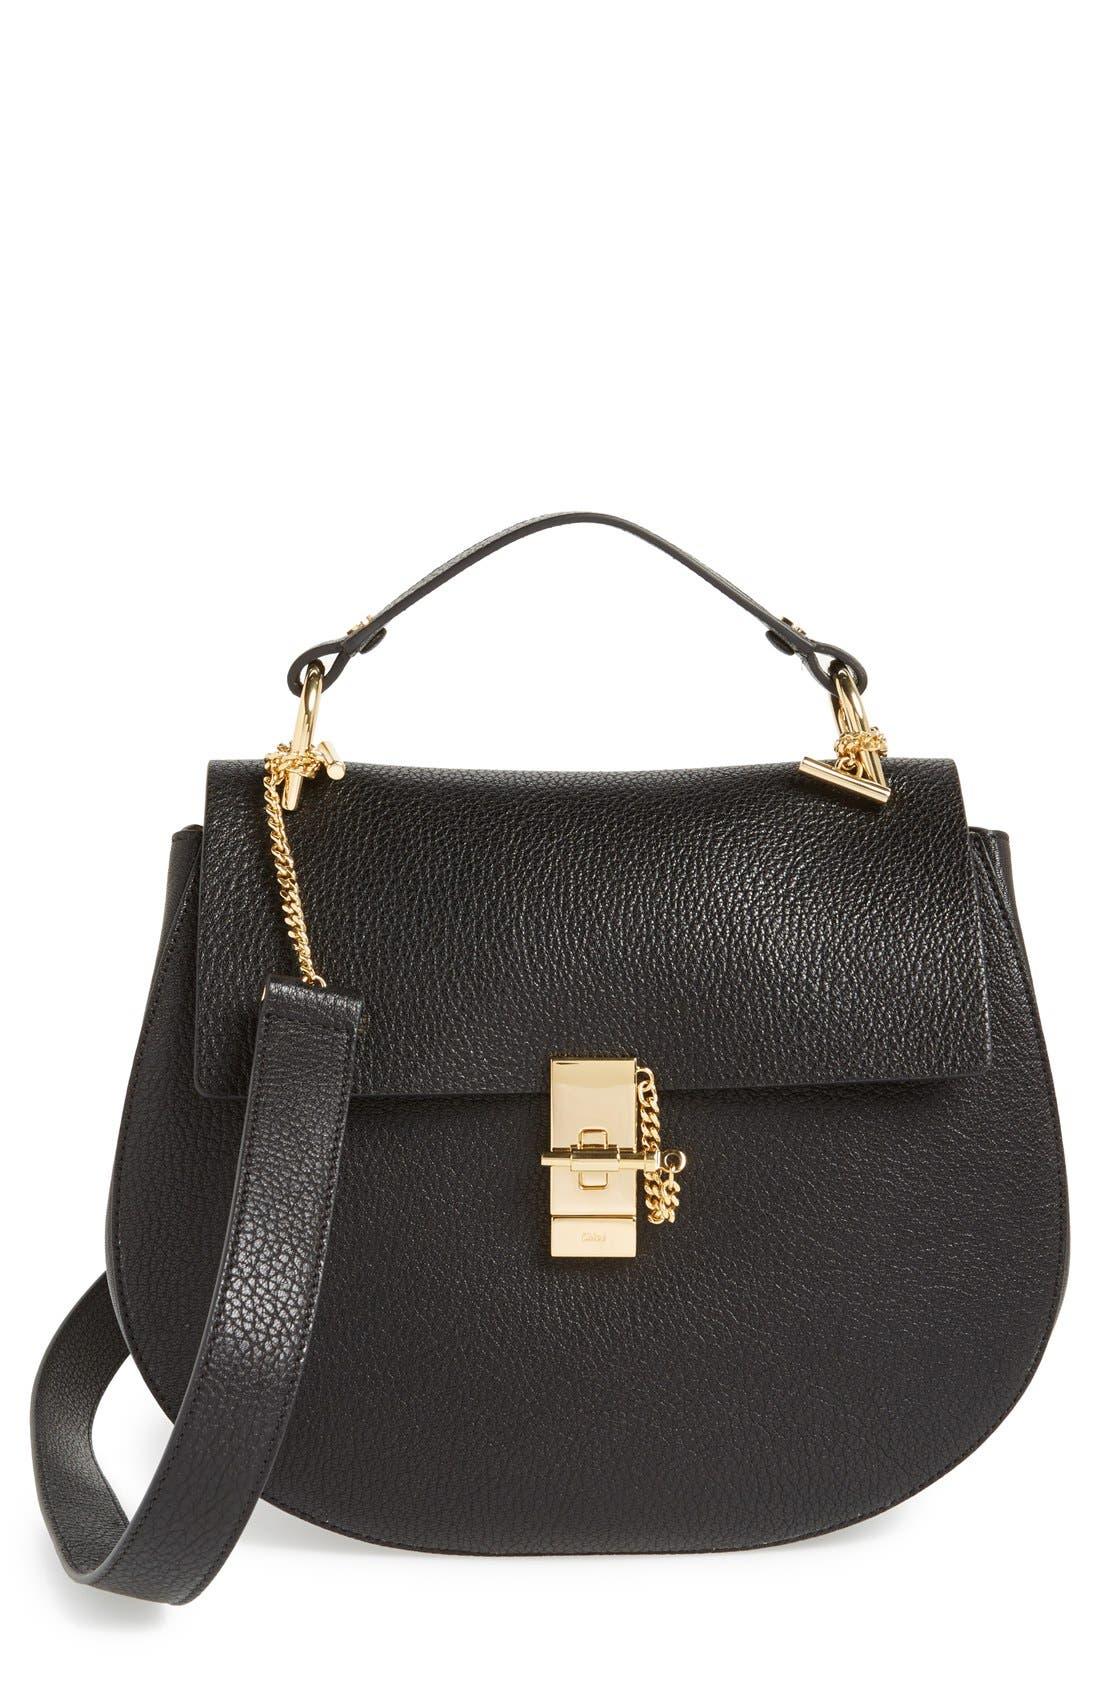 Main Image - Chloé 'Drew - Medium' Leather Crossbody Bag